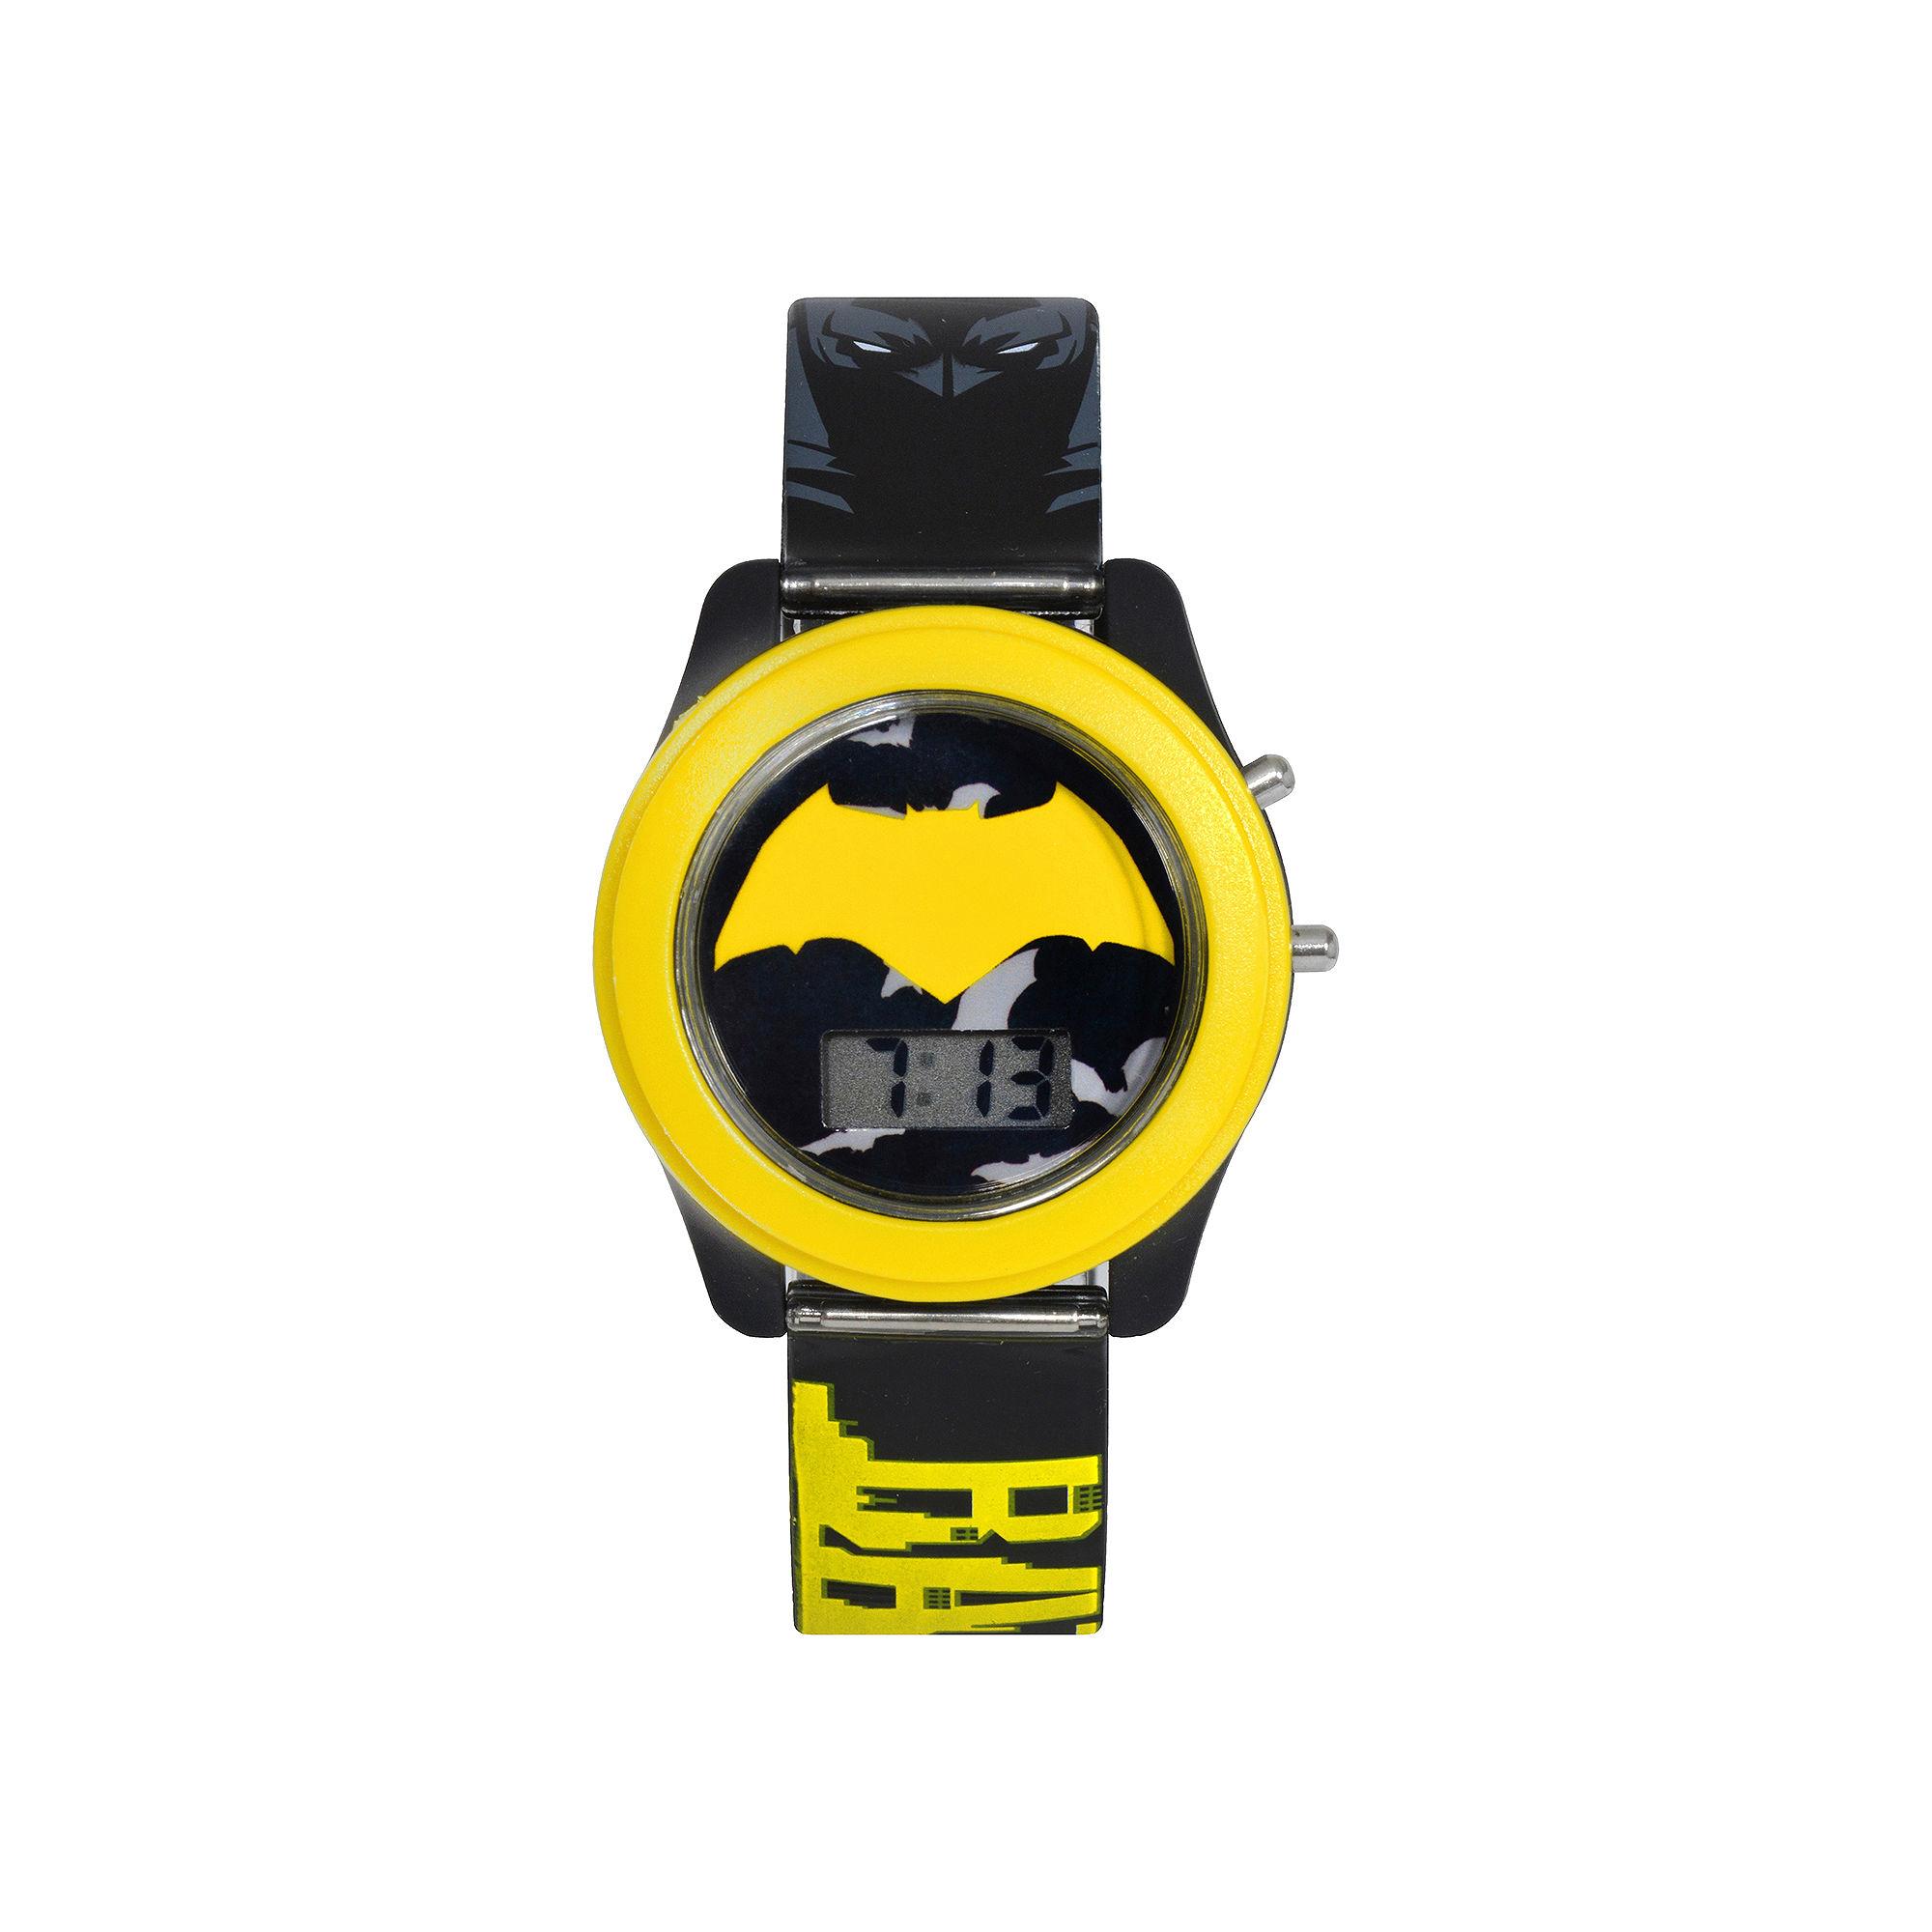 DC Comics Batman vs. Superman LCD Flash Dial with Printed Yellow Batman Watch